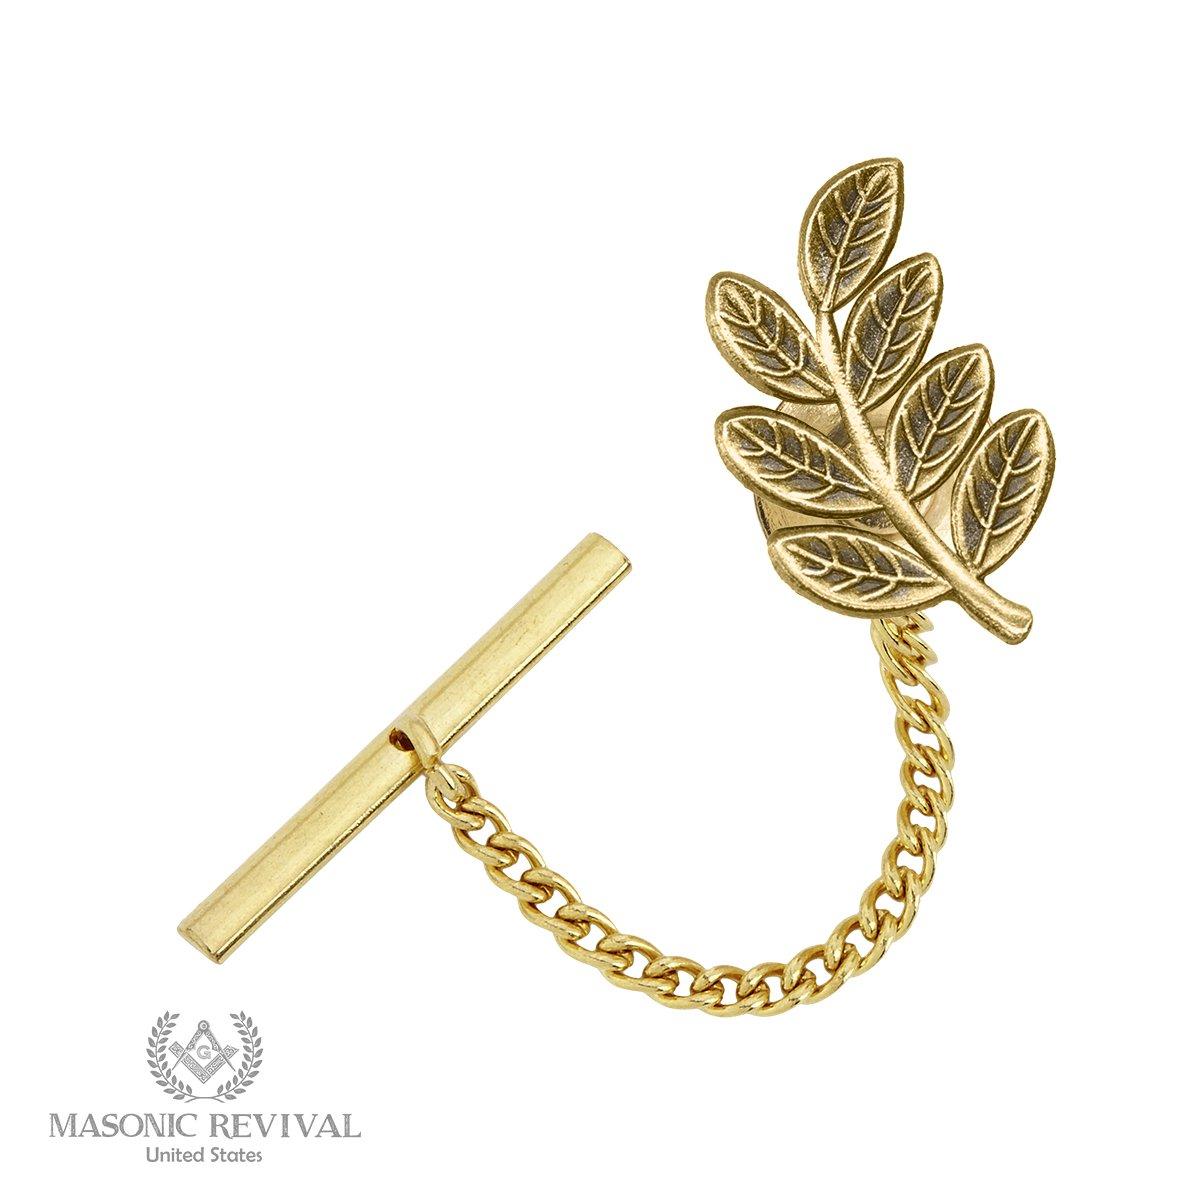 Sprig of Acacia Tie Pin Tack by Masonic Revival (Antique Gold) Bro. Edgar Alejandro 17MTT011